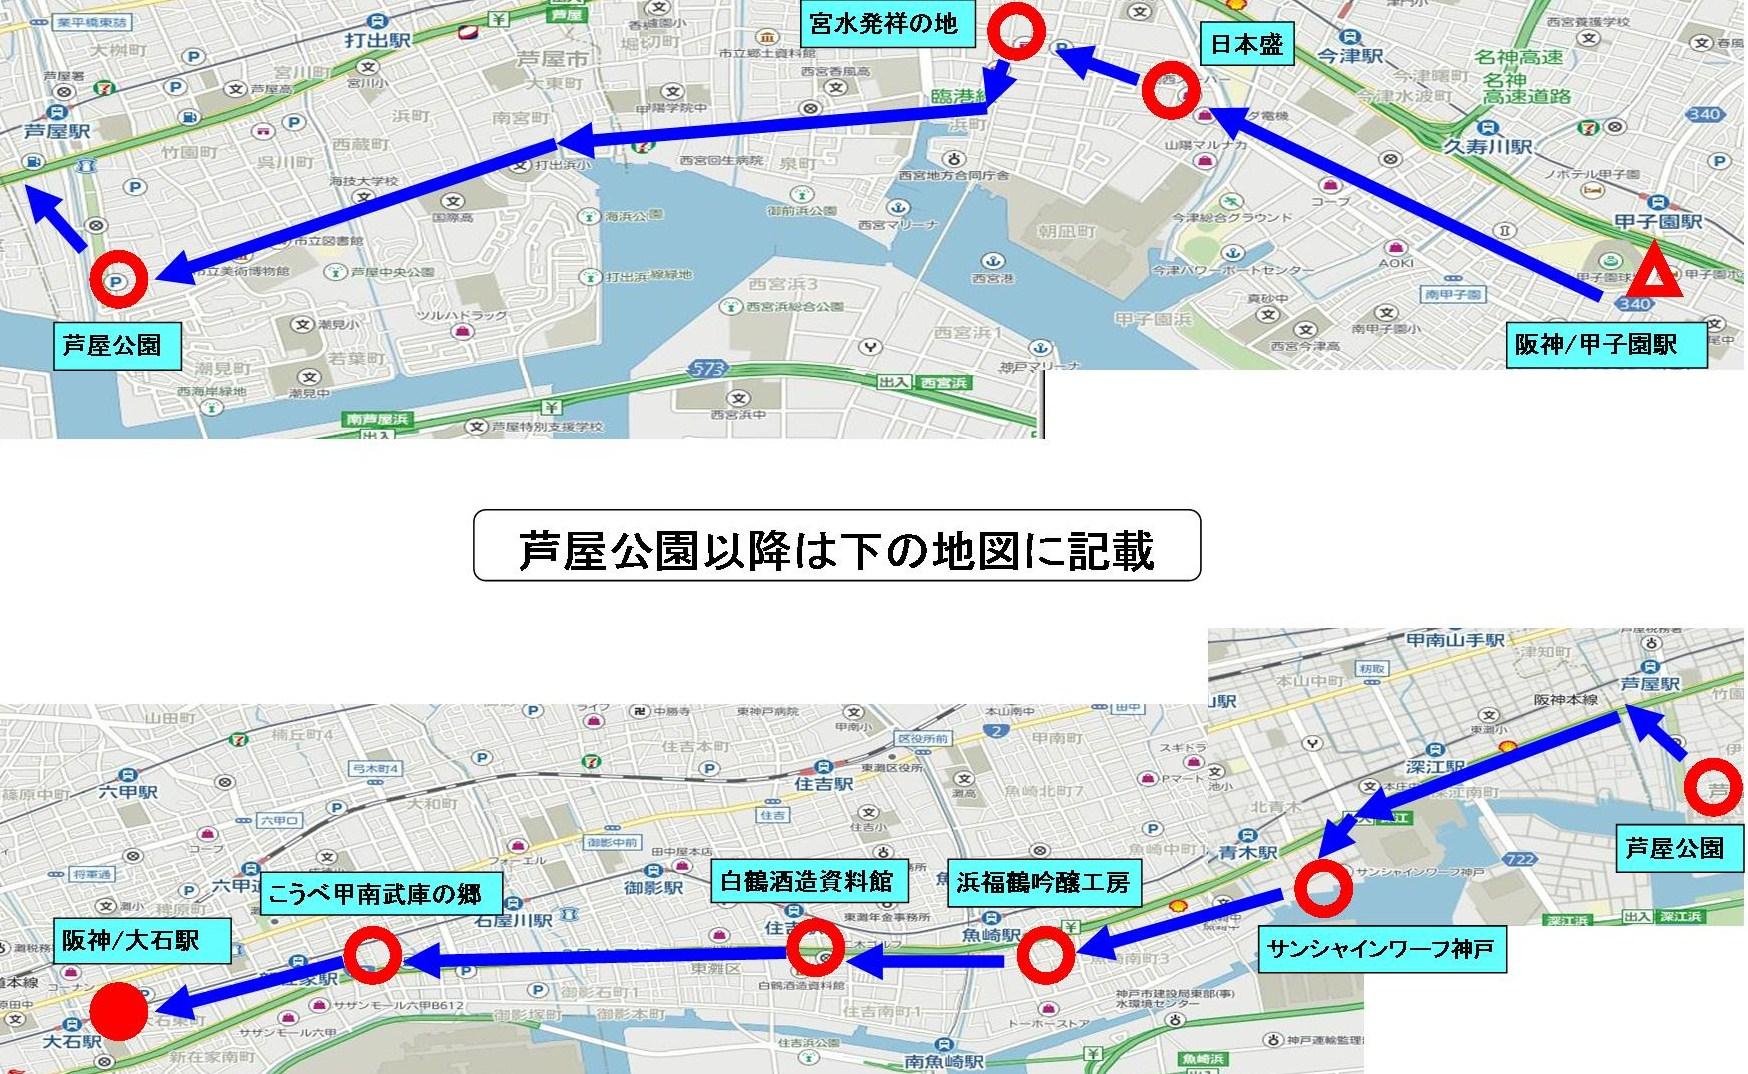 a酒造通り散策地図.jpg